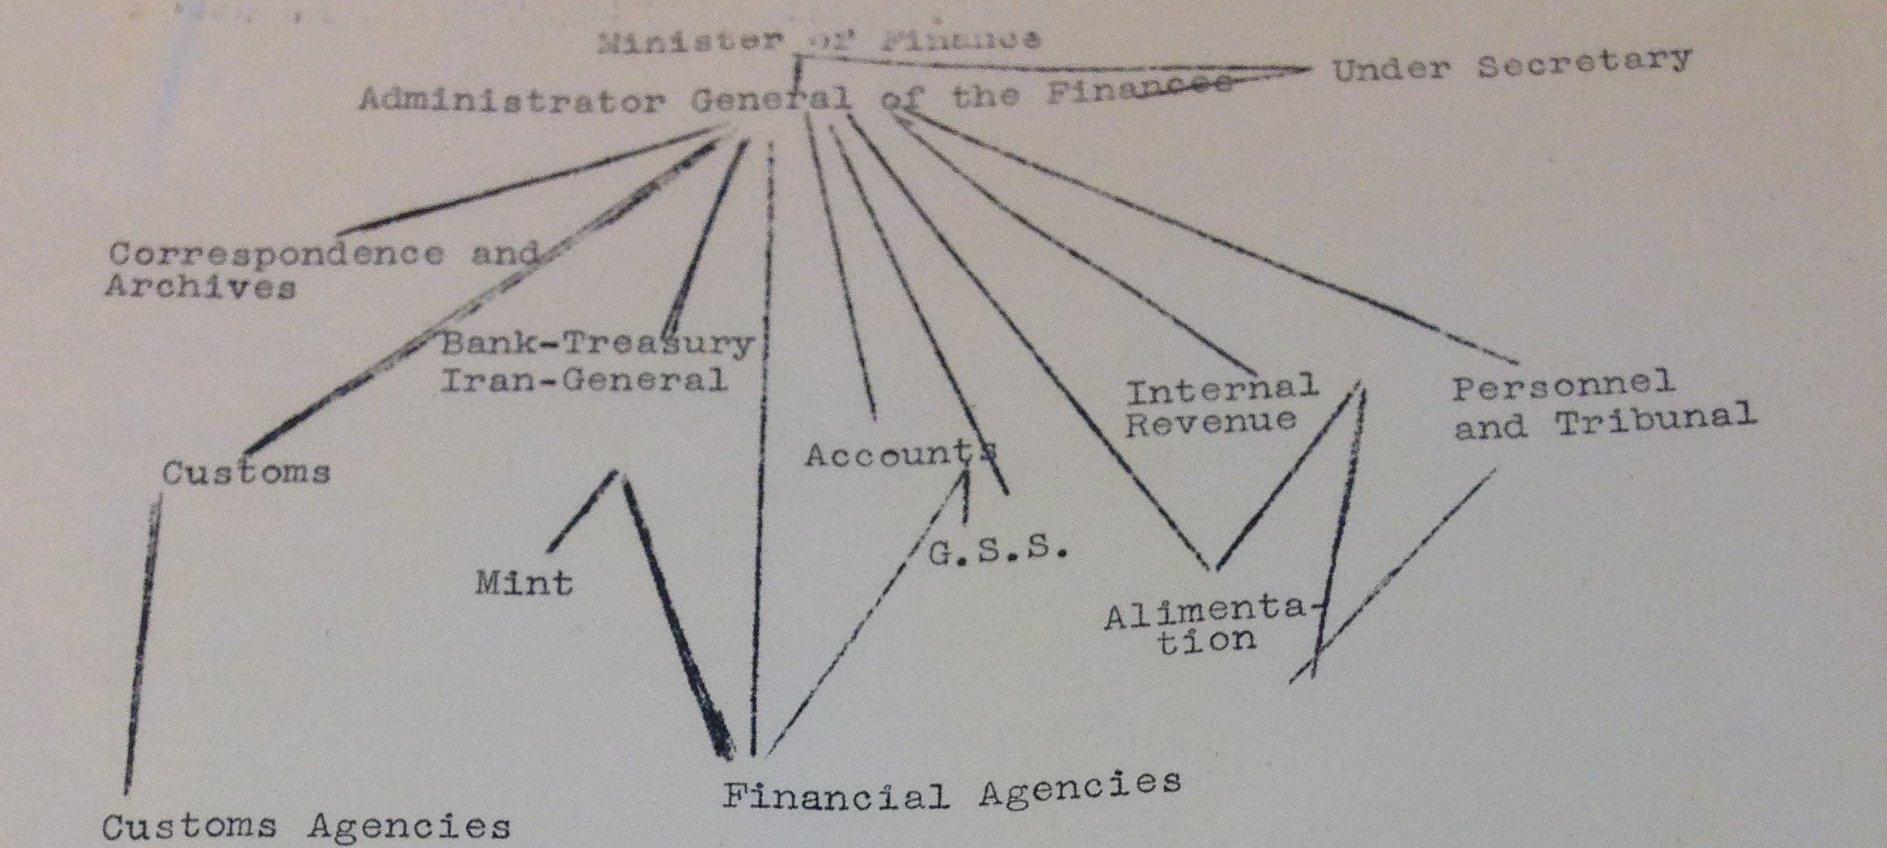 RT @jamiemartin2: Visualization of organization…